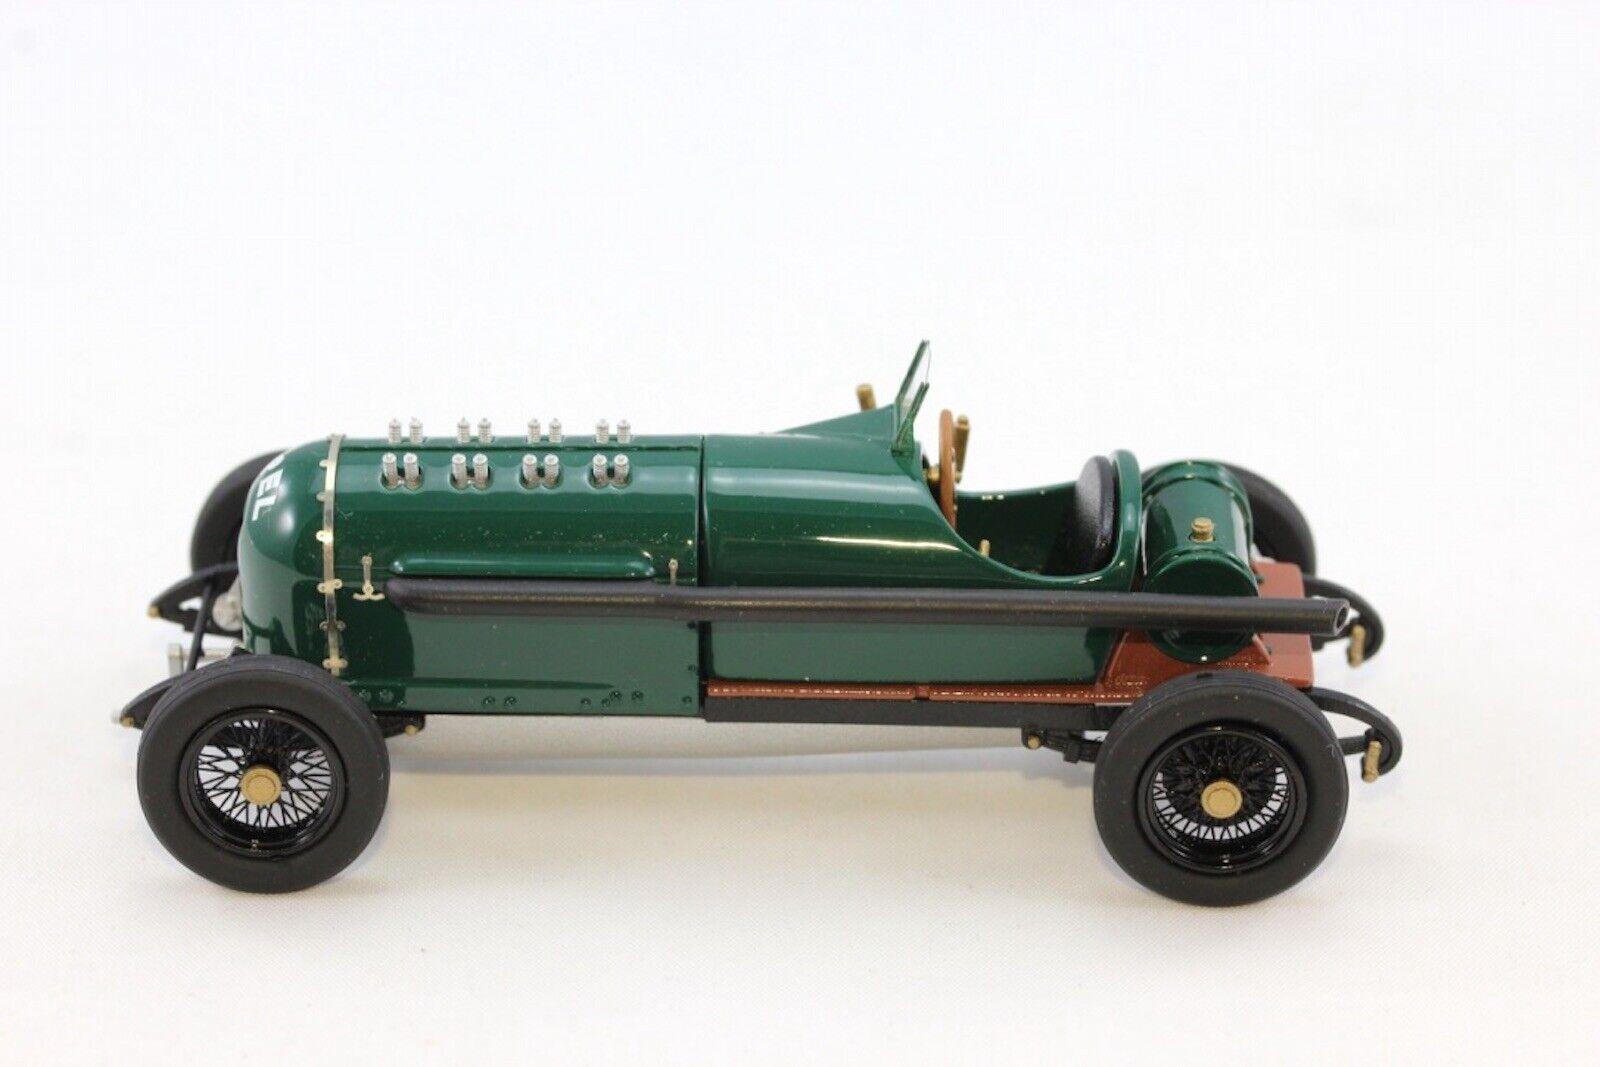 Opel voiture de course 12,3 L 260 ch CARL JÖRNS 1914 le monstre vert TIN WIZARD tw315-1